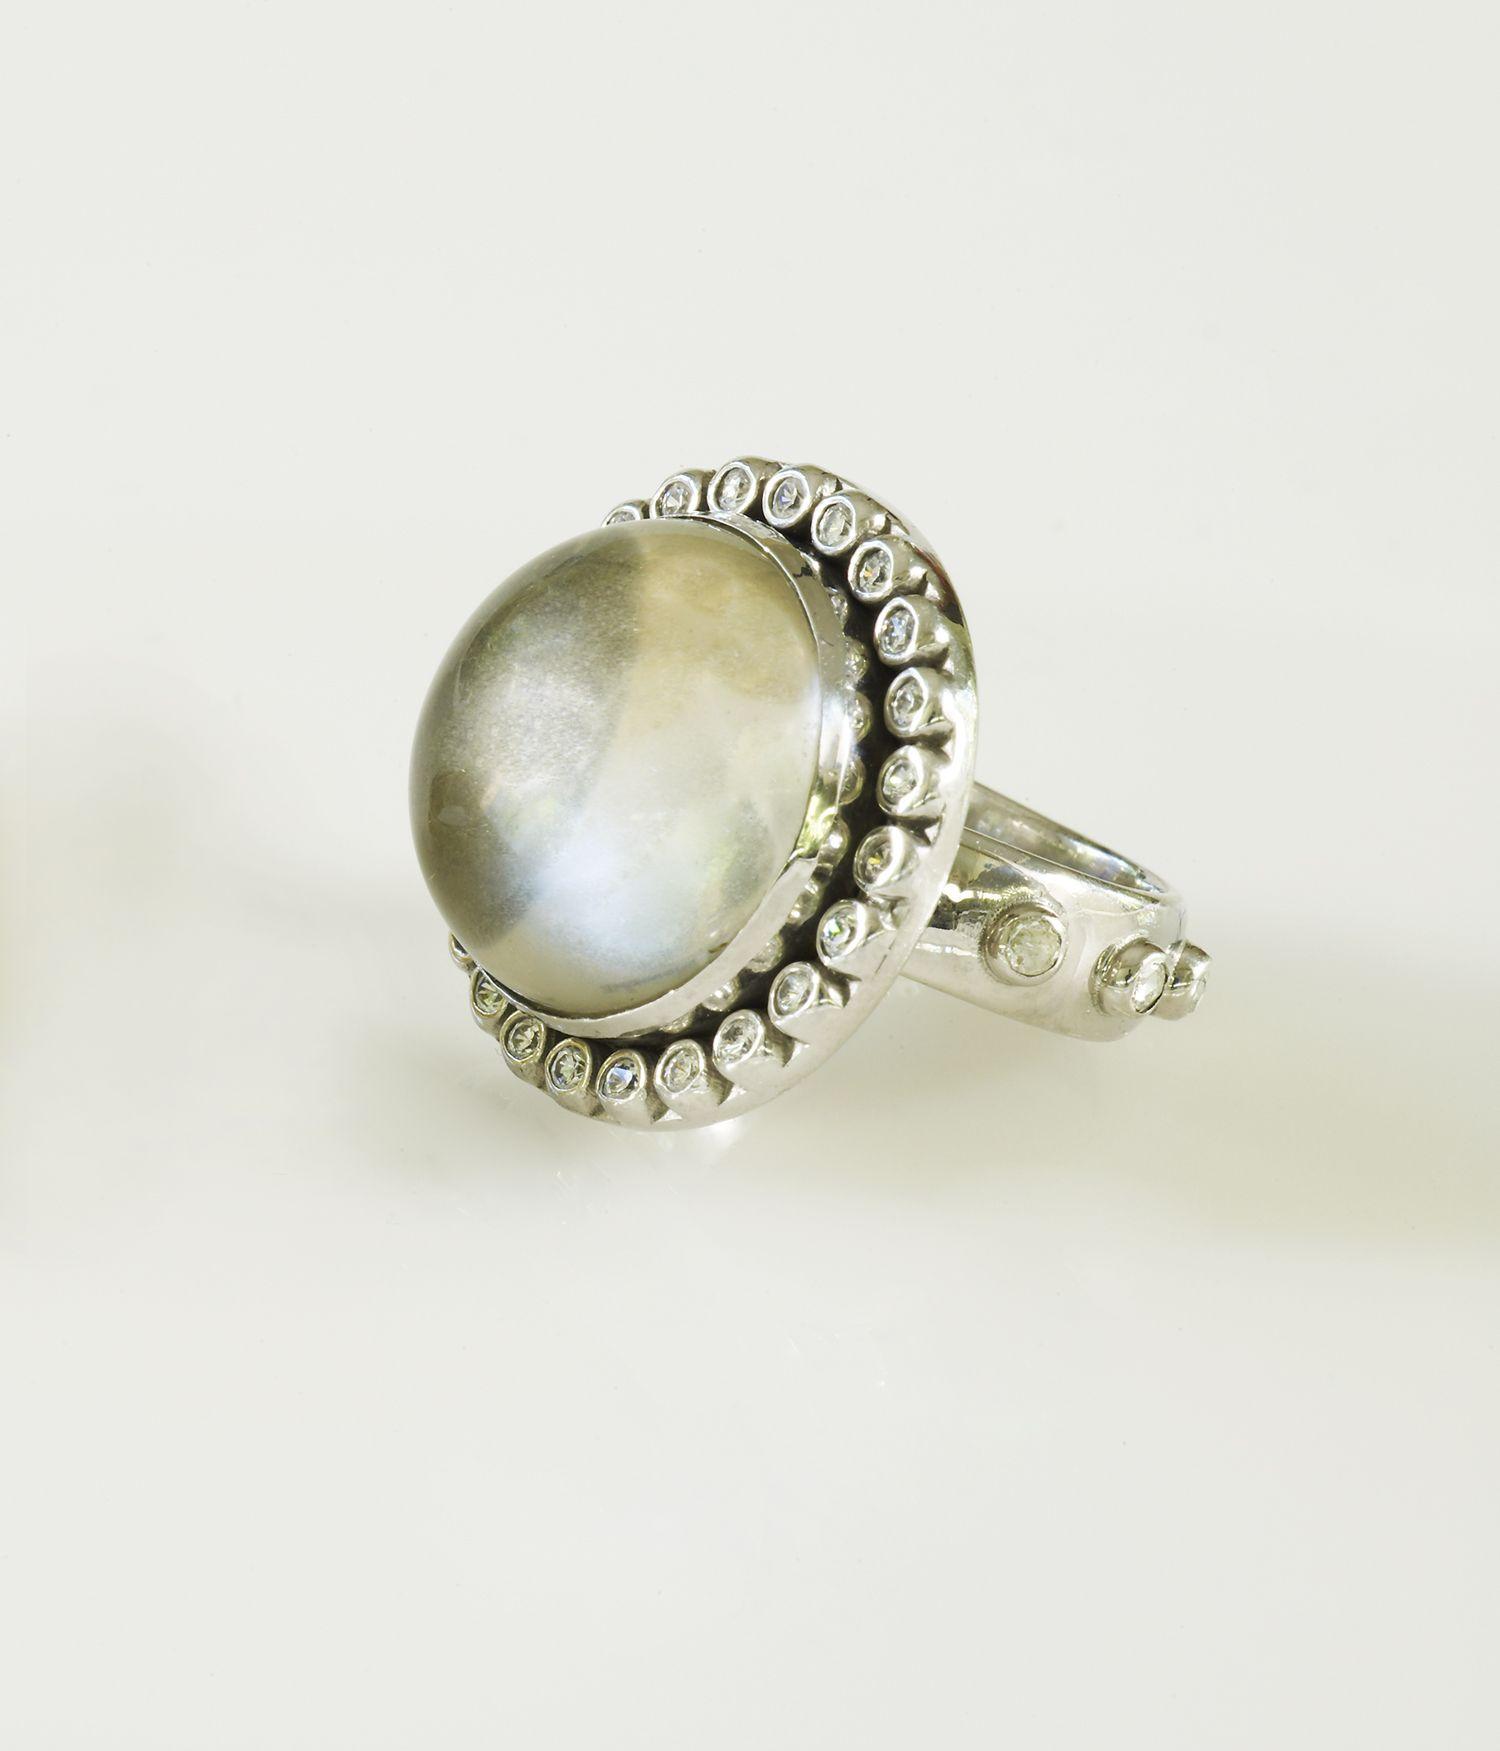 Modern Mary Ring Diamond Rosary Band and Bezel KATIE design